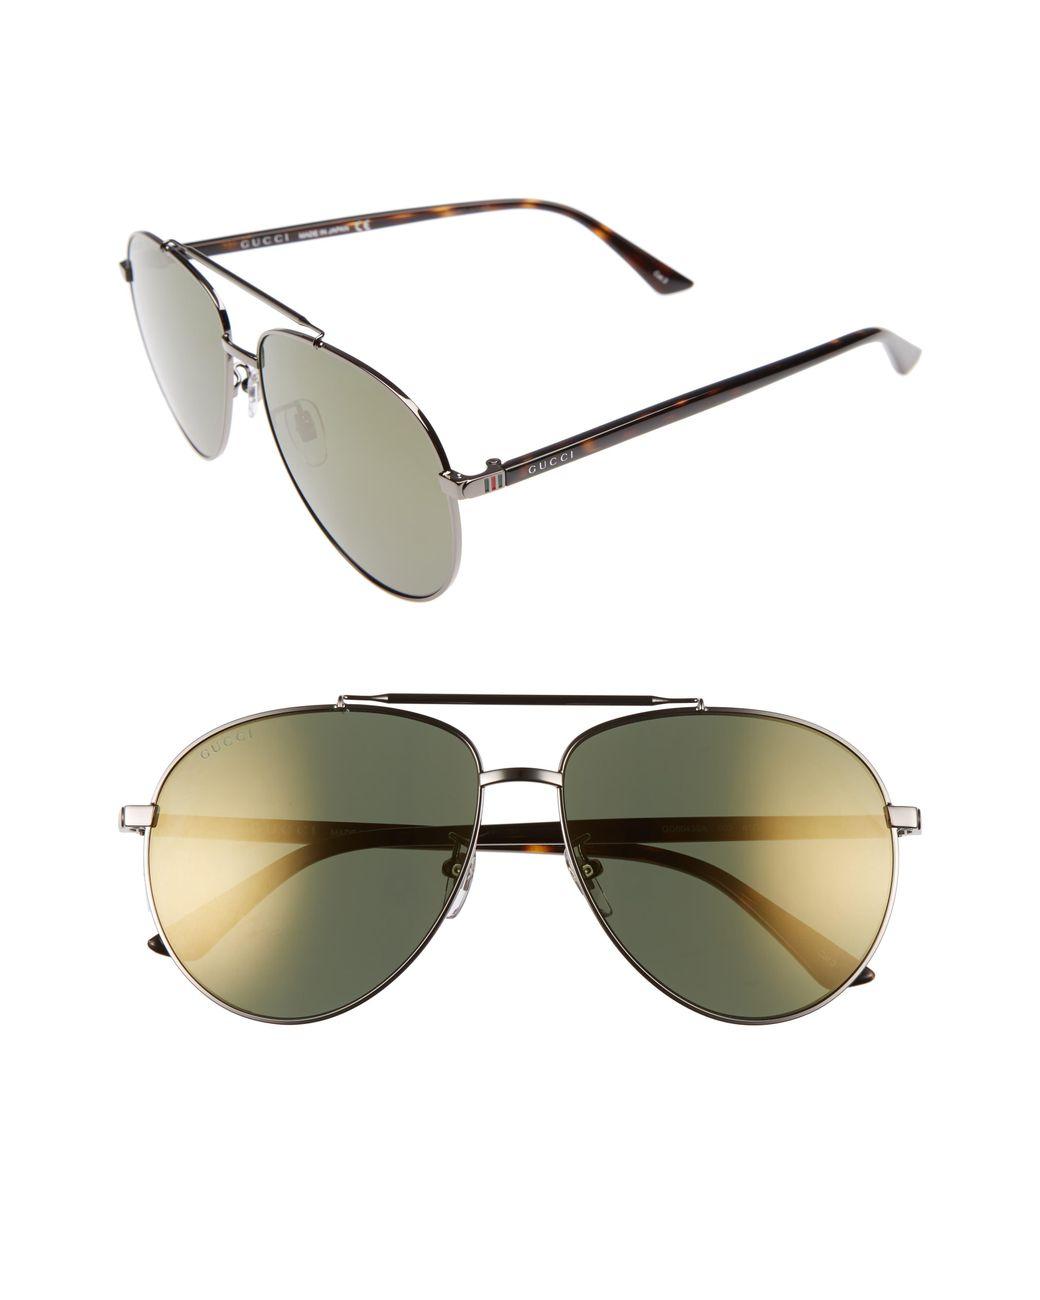 ea1e5b5a7 Gucci Retro Web 61mm Aviator Sunglasses - Ruthenium W.mirror Gun Lens in  Metallic for Men - Lyst